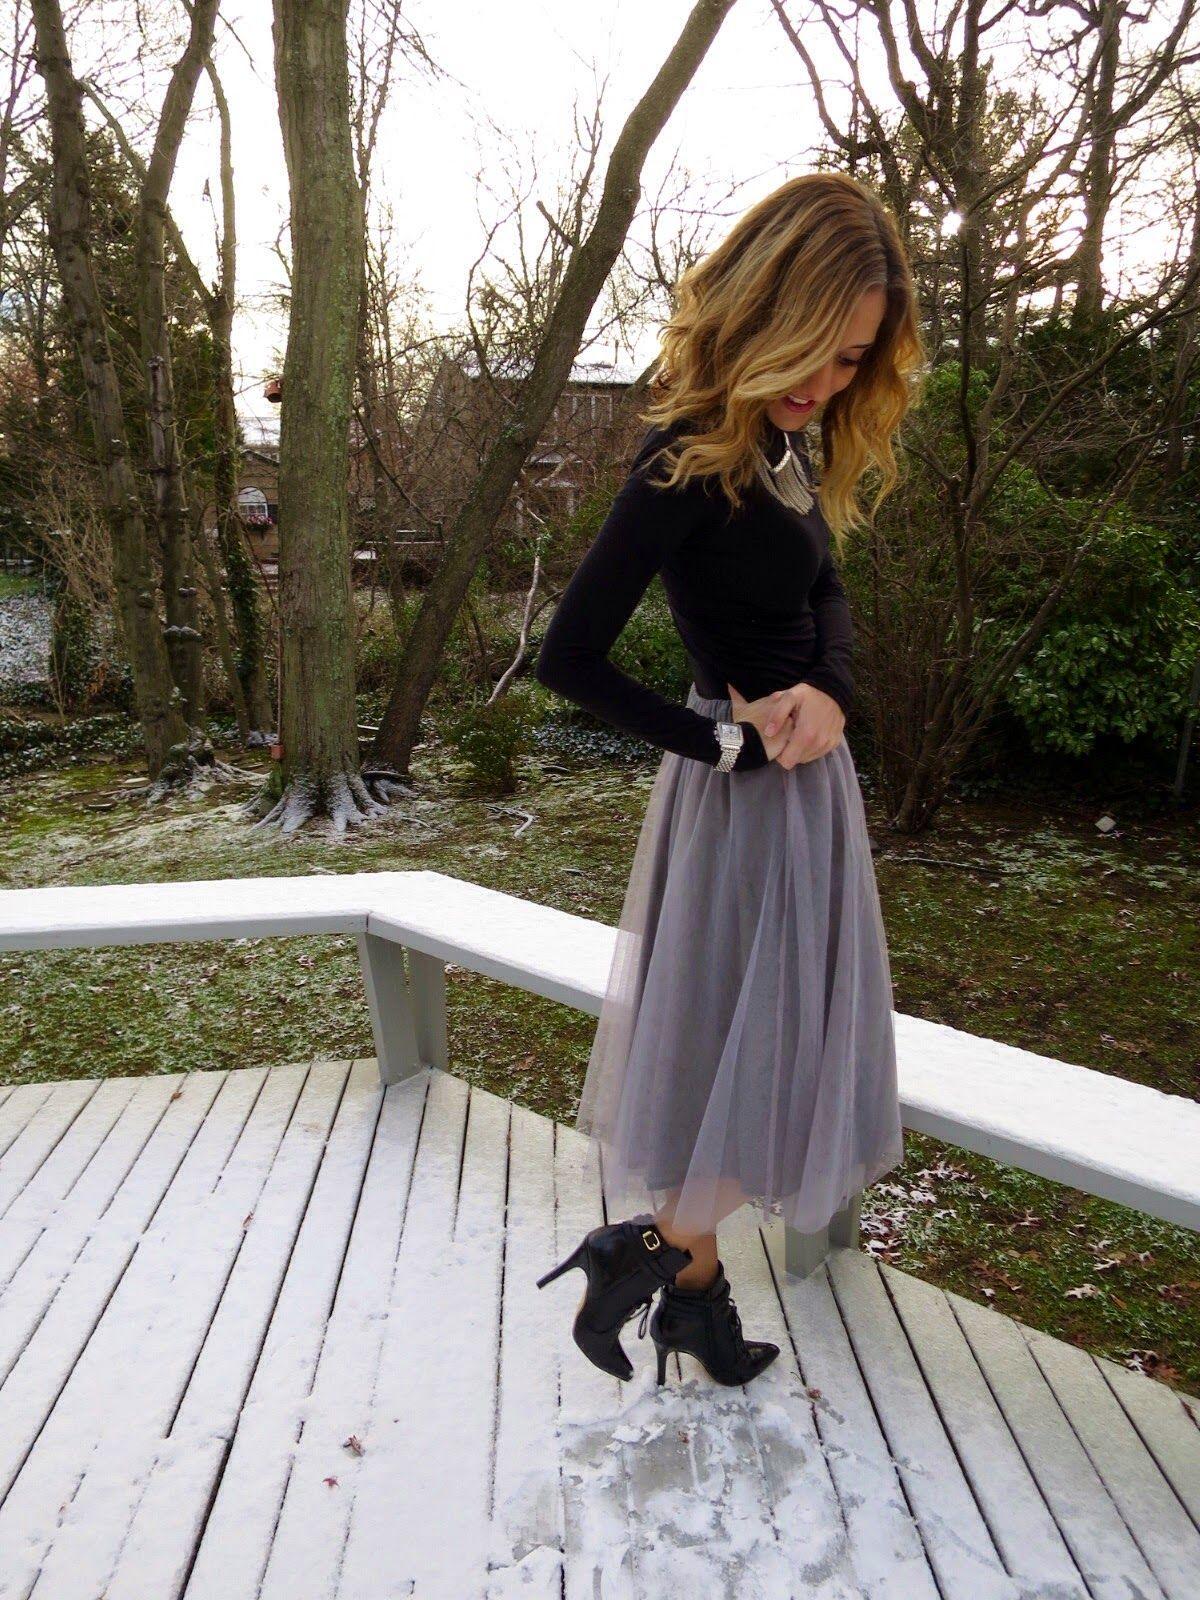 d43d894c2e Fashion: Gray Lauren Conrad Tulle Skirt with Black Top | Dress Up ...